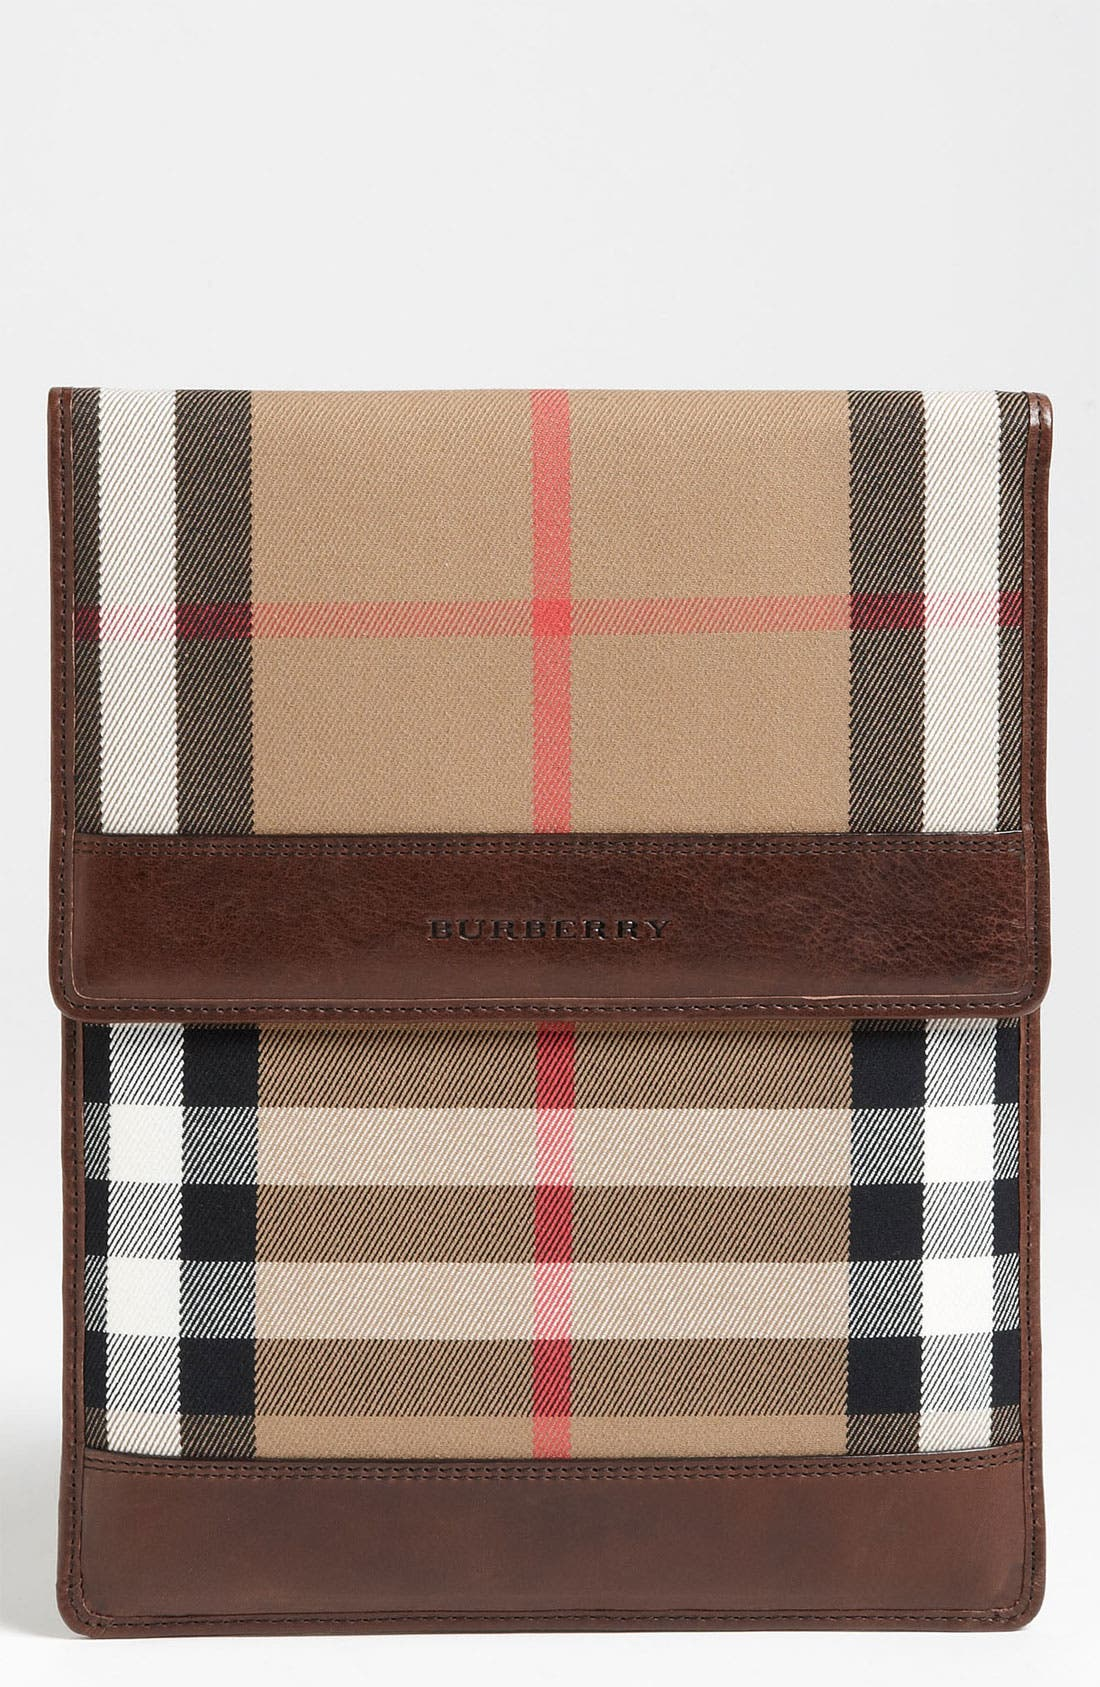 Main Image - Burberry 'House Check' iPad Sleeve